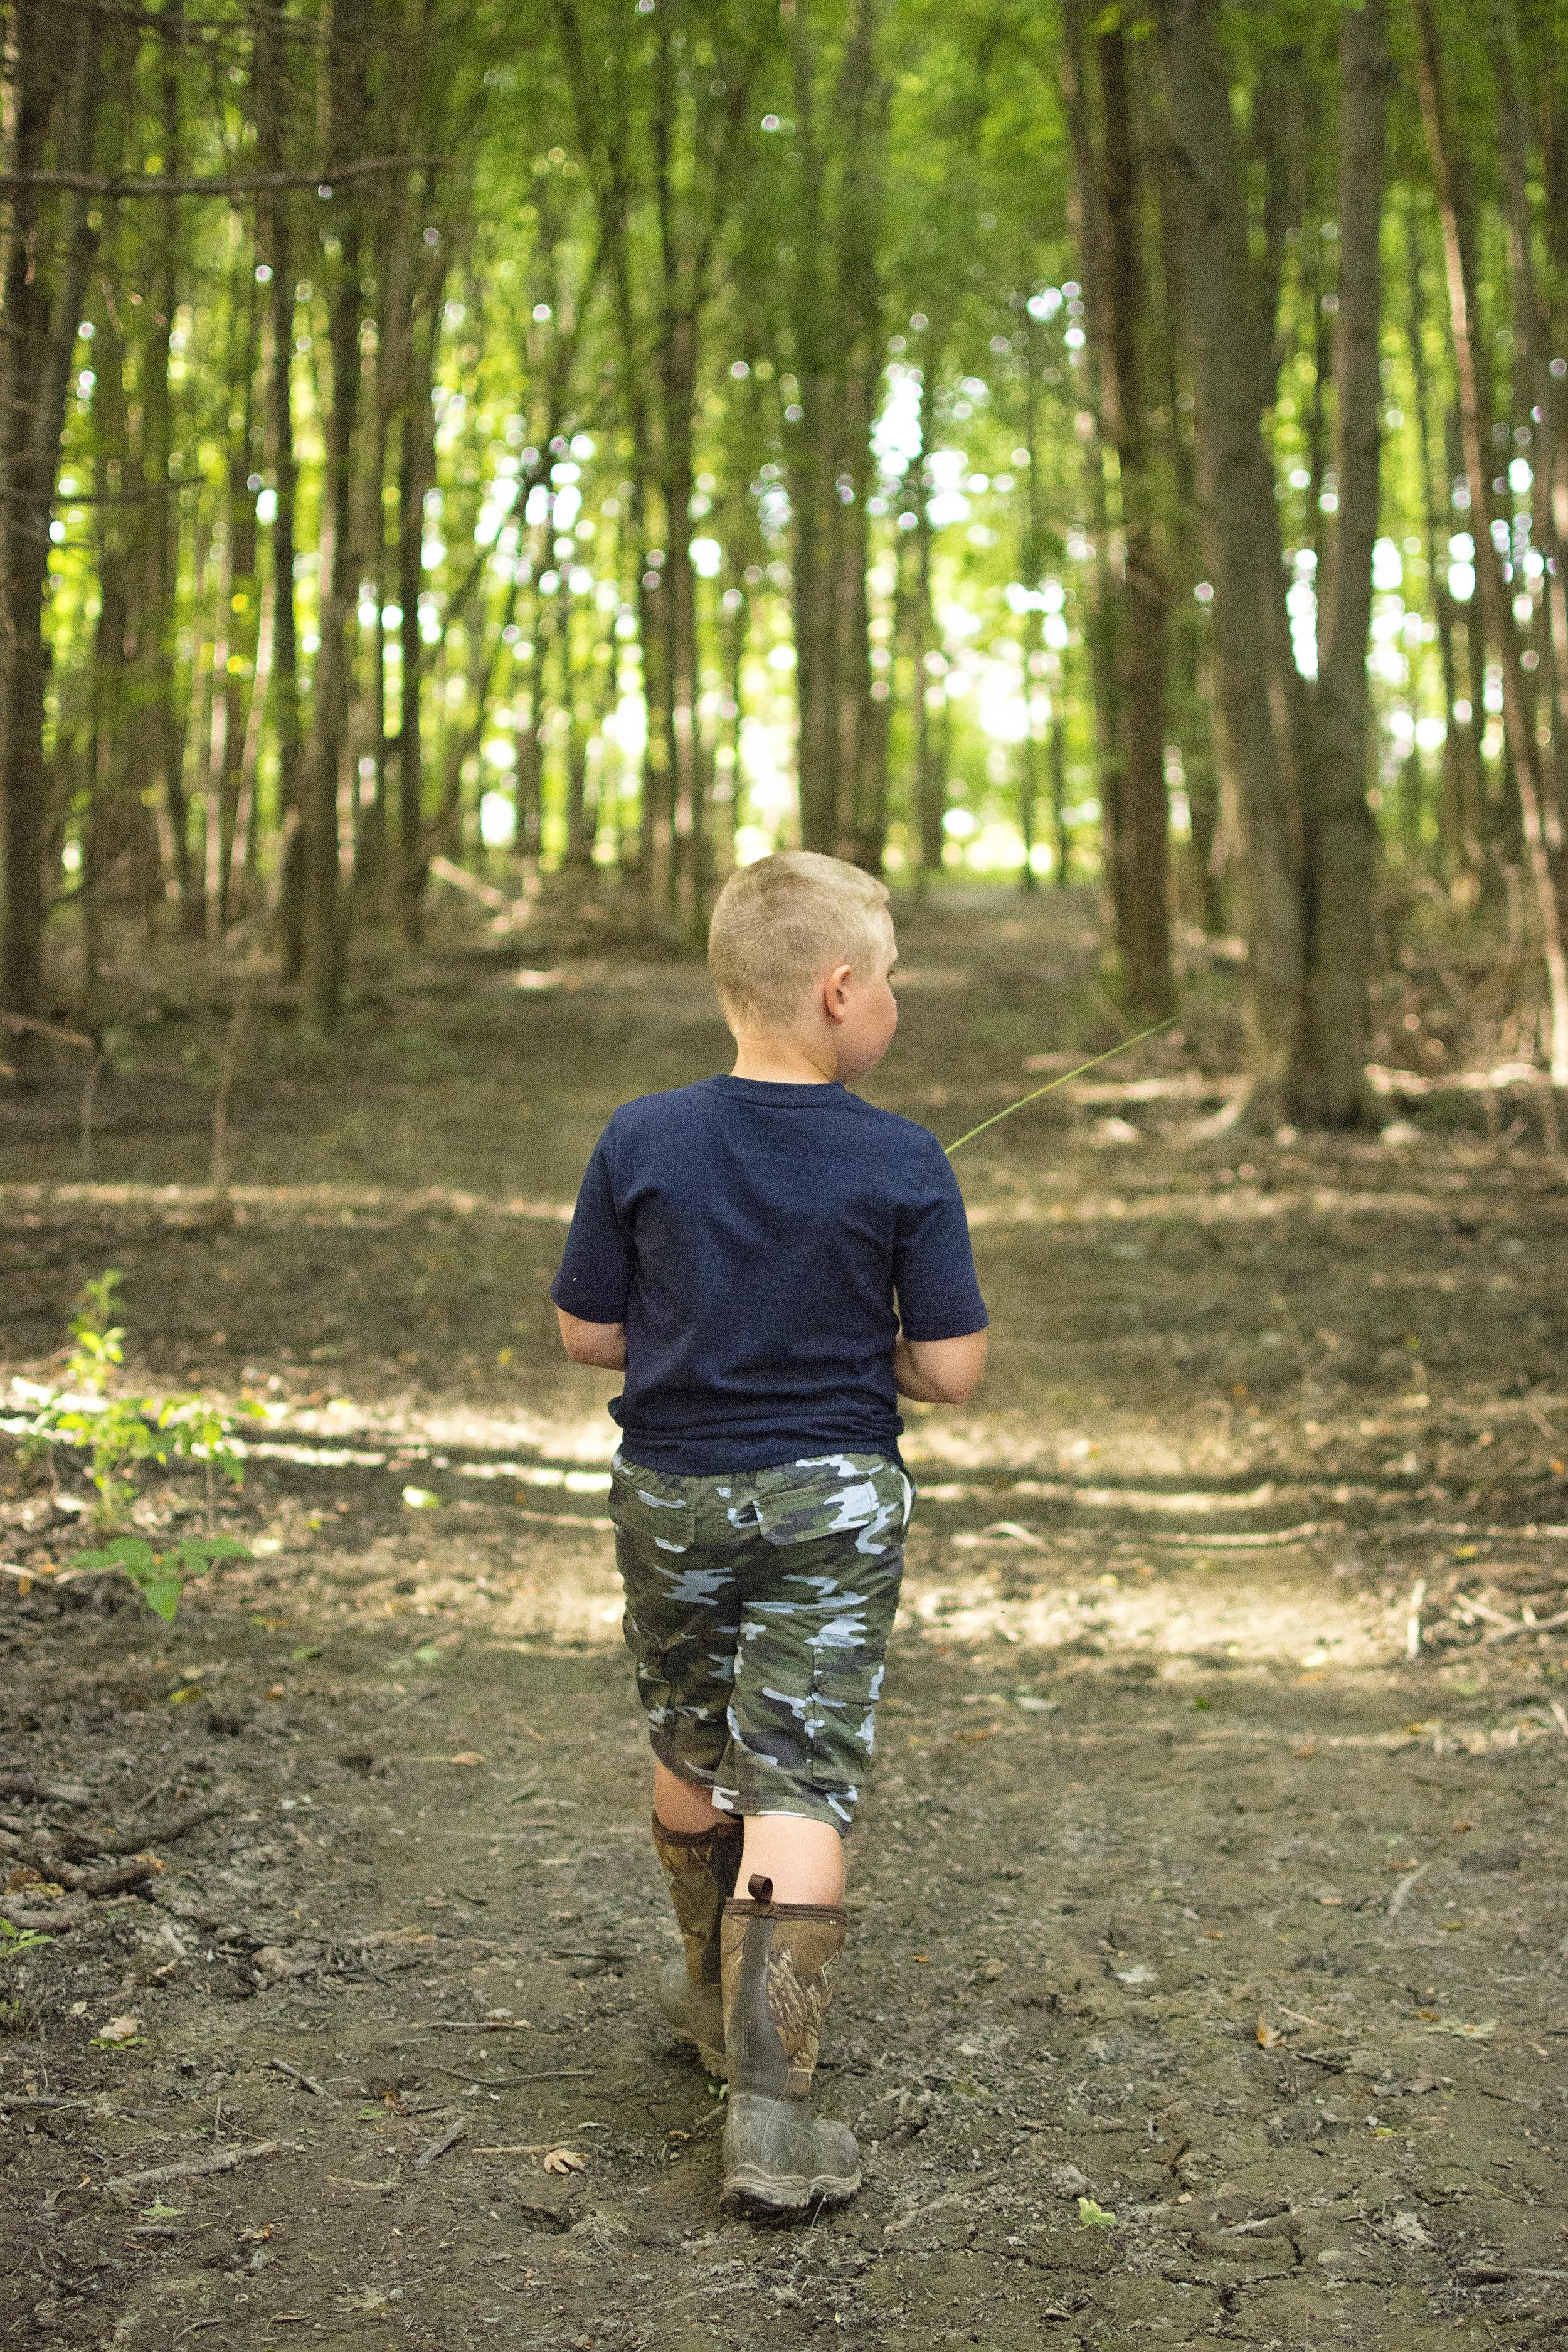 One of Braedan's favorite things to do, exploring the woods.